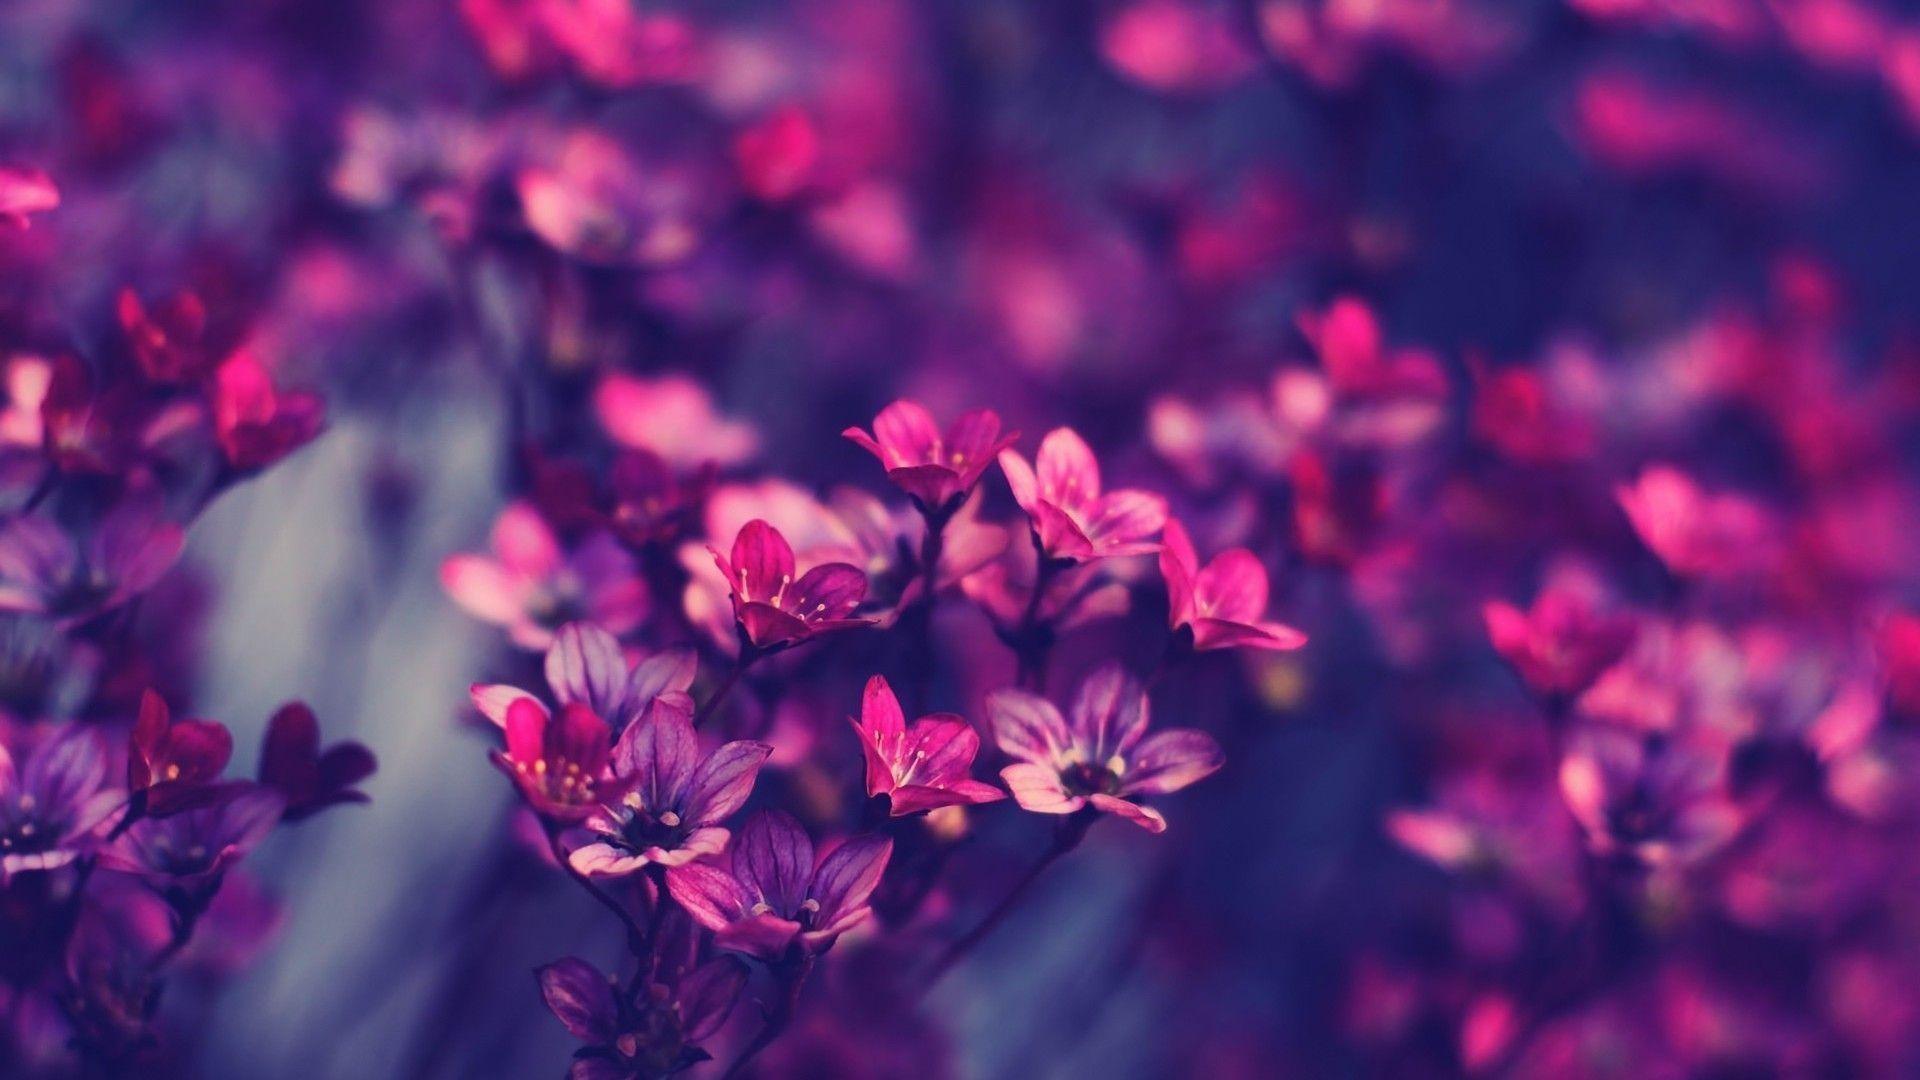 Desktop Background Flowers 67 Pictures